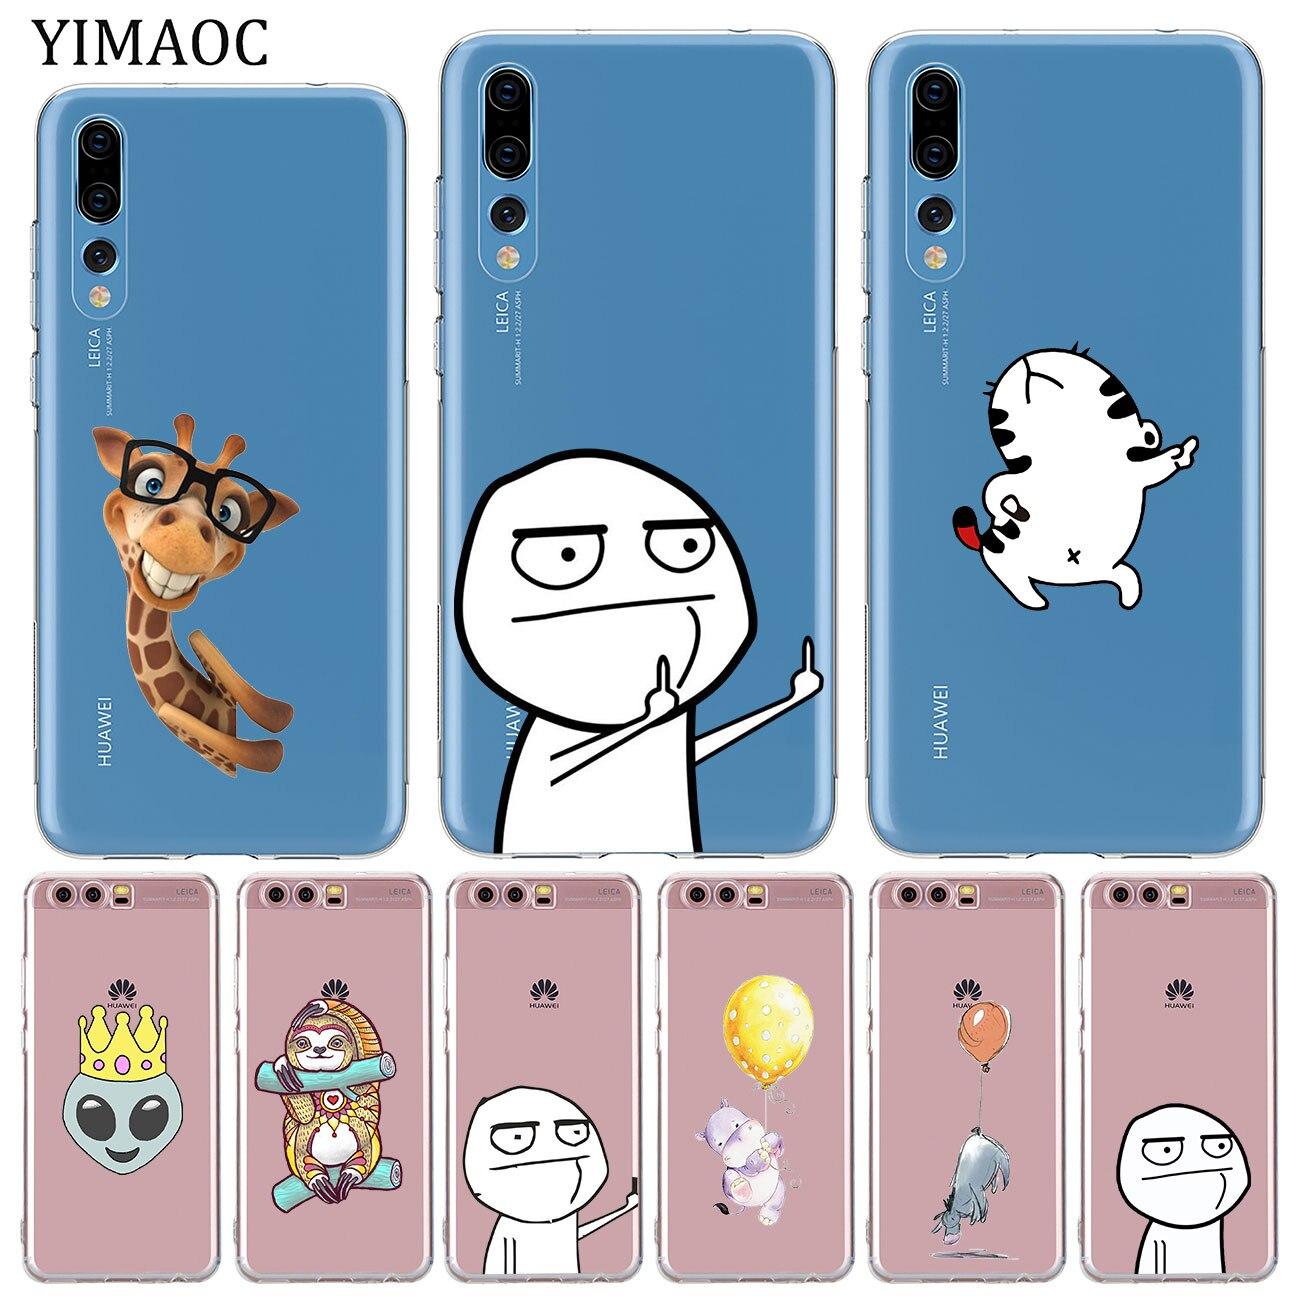 YIMAOC-funda de silicona para Huawei P30, P20 Pro, P10, P8, P9 Lite,...